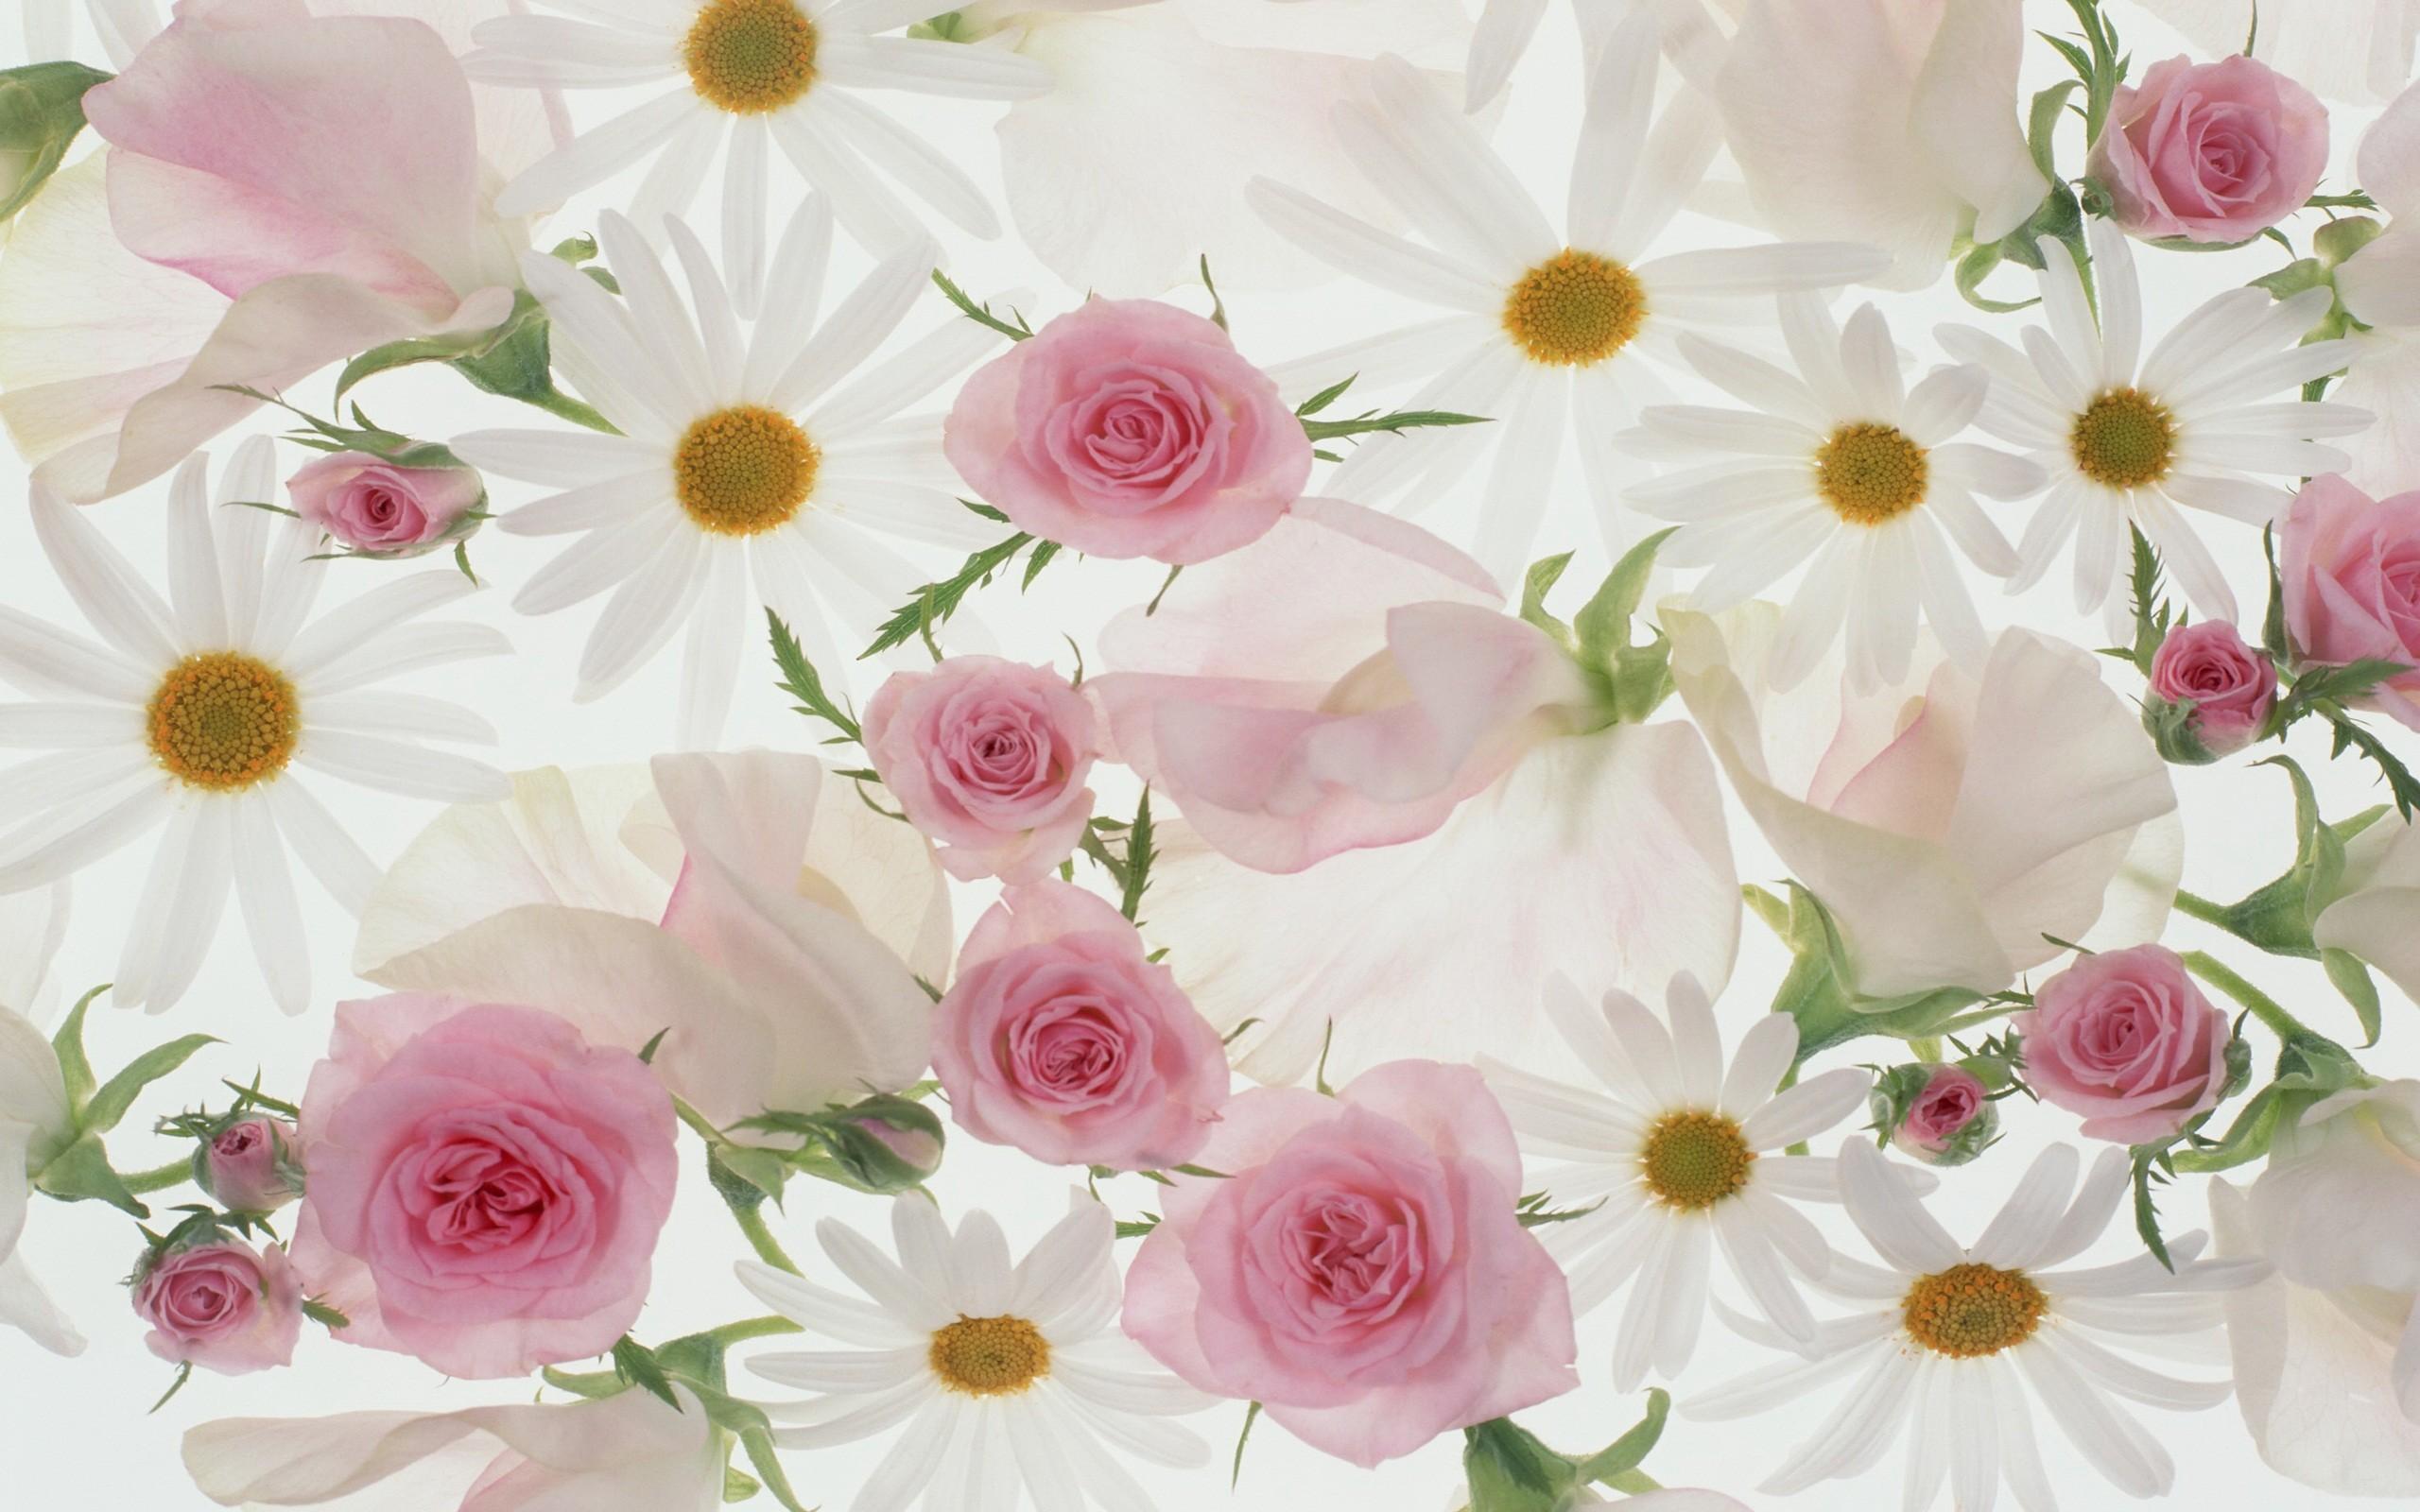 beautiful flowers wallpaper 60 images